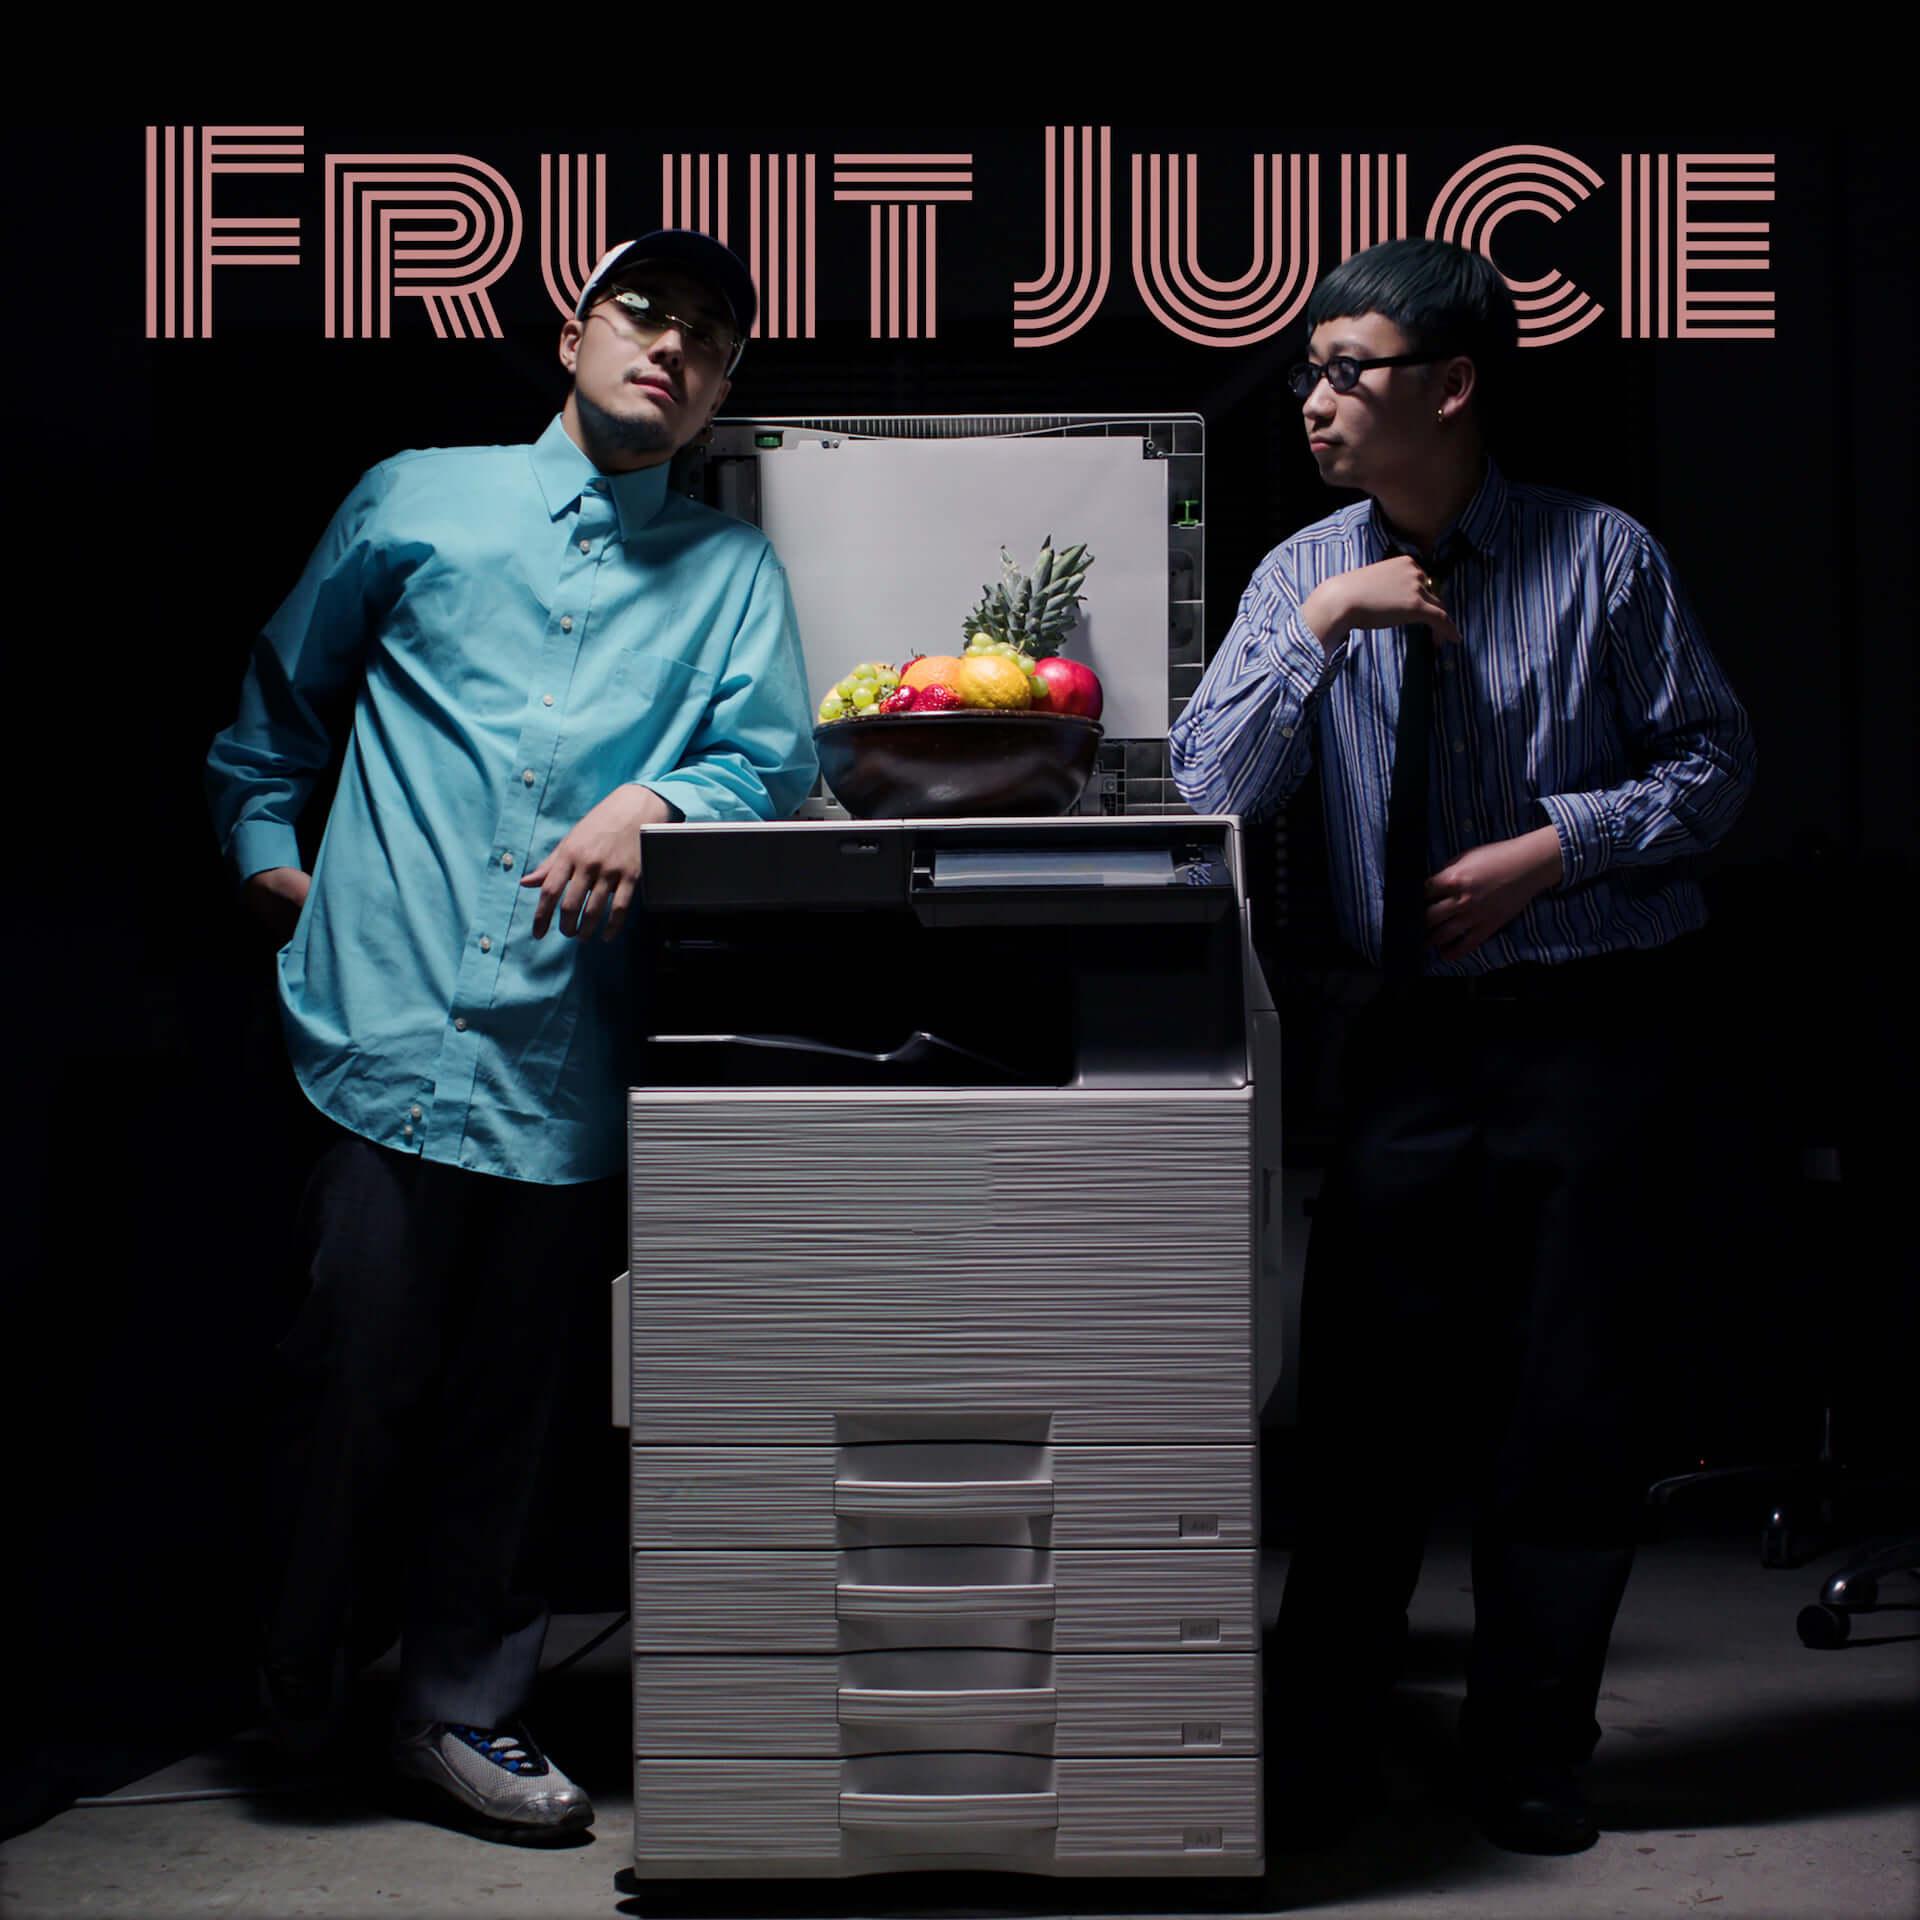 "CreativeDrugStoreでも活動するBIMとVaVaが再びコラボ!連名シングル""Fruit Juice""が明日リリース music210323_bim-vava_1-1920x1920"